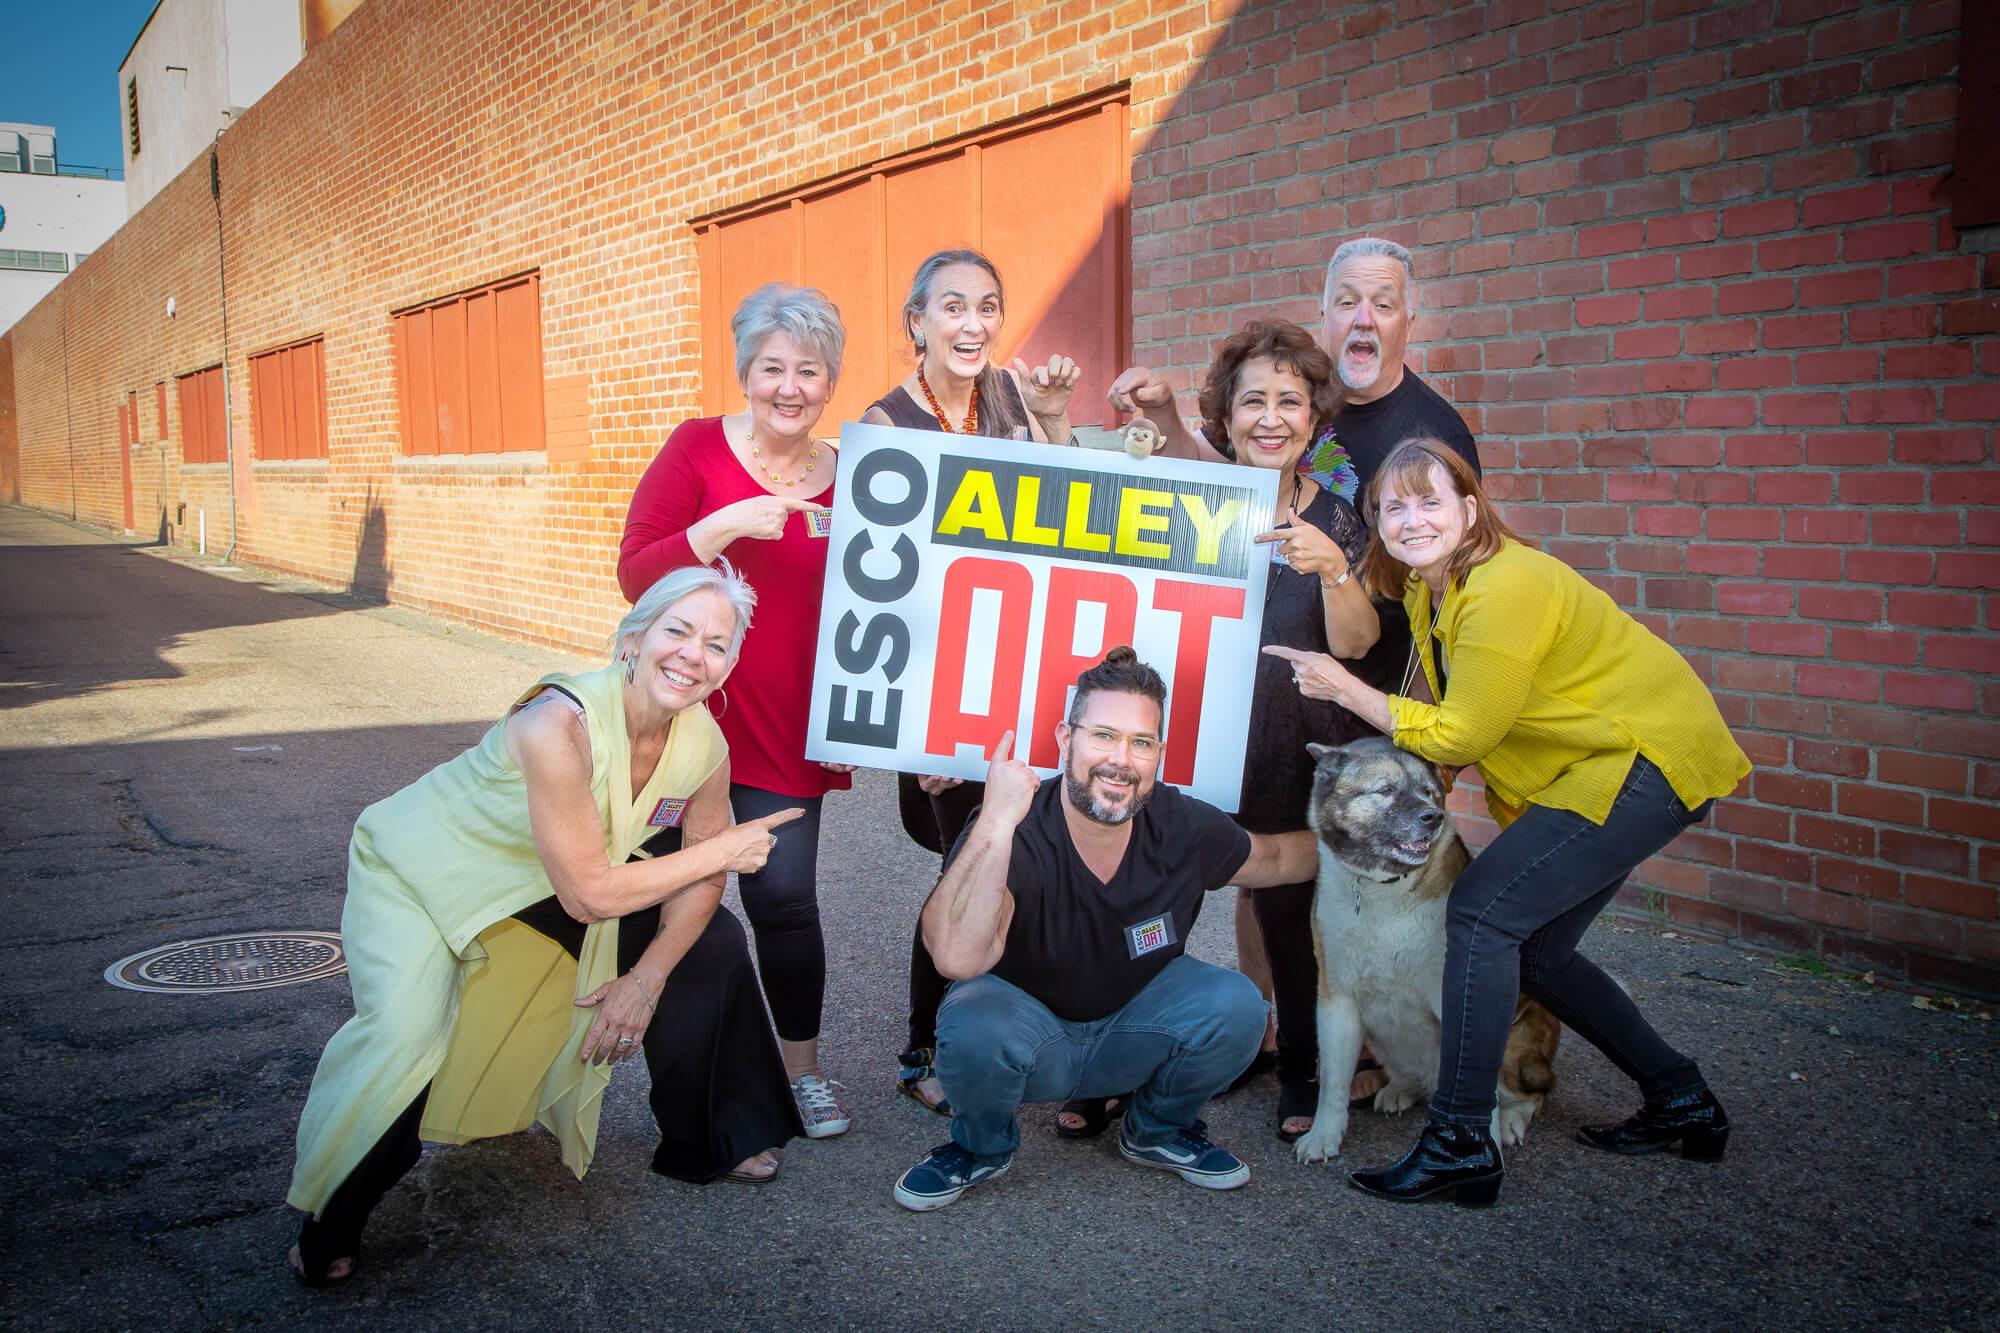 Esco Alley Art Committee & Friends